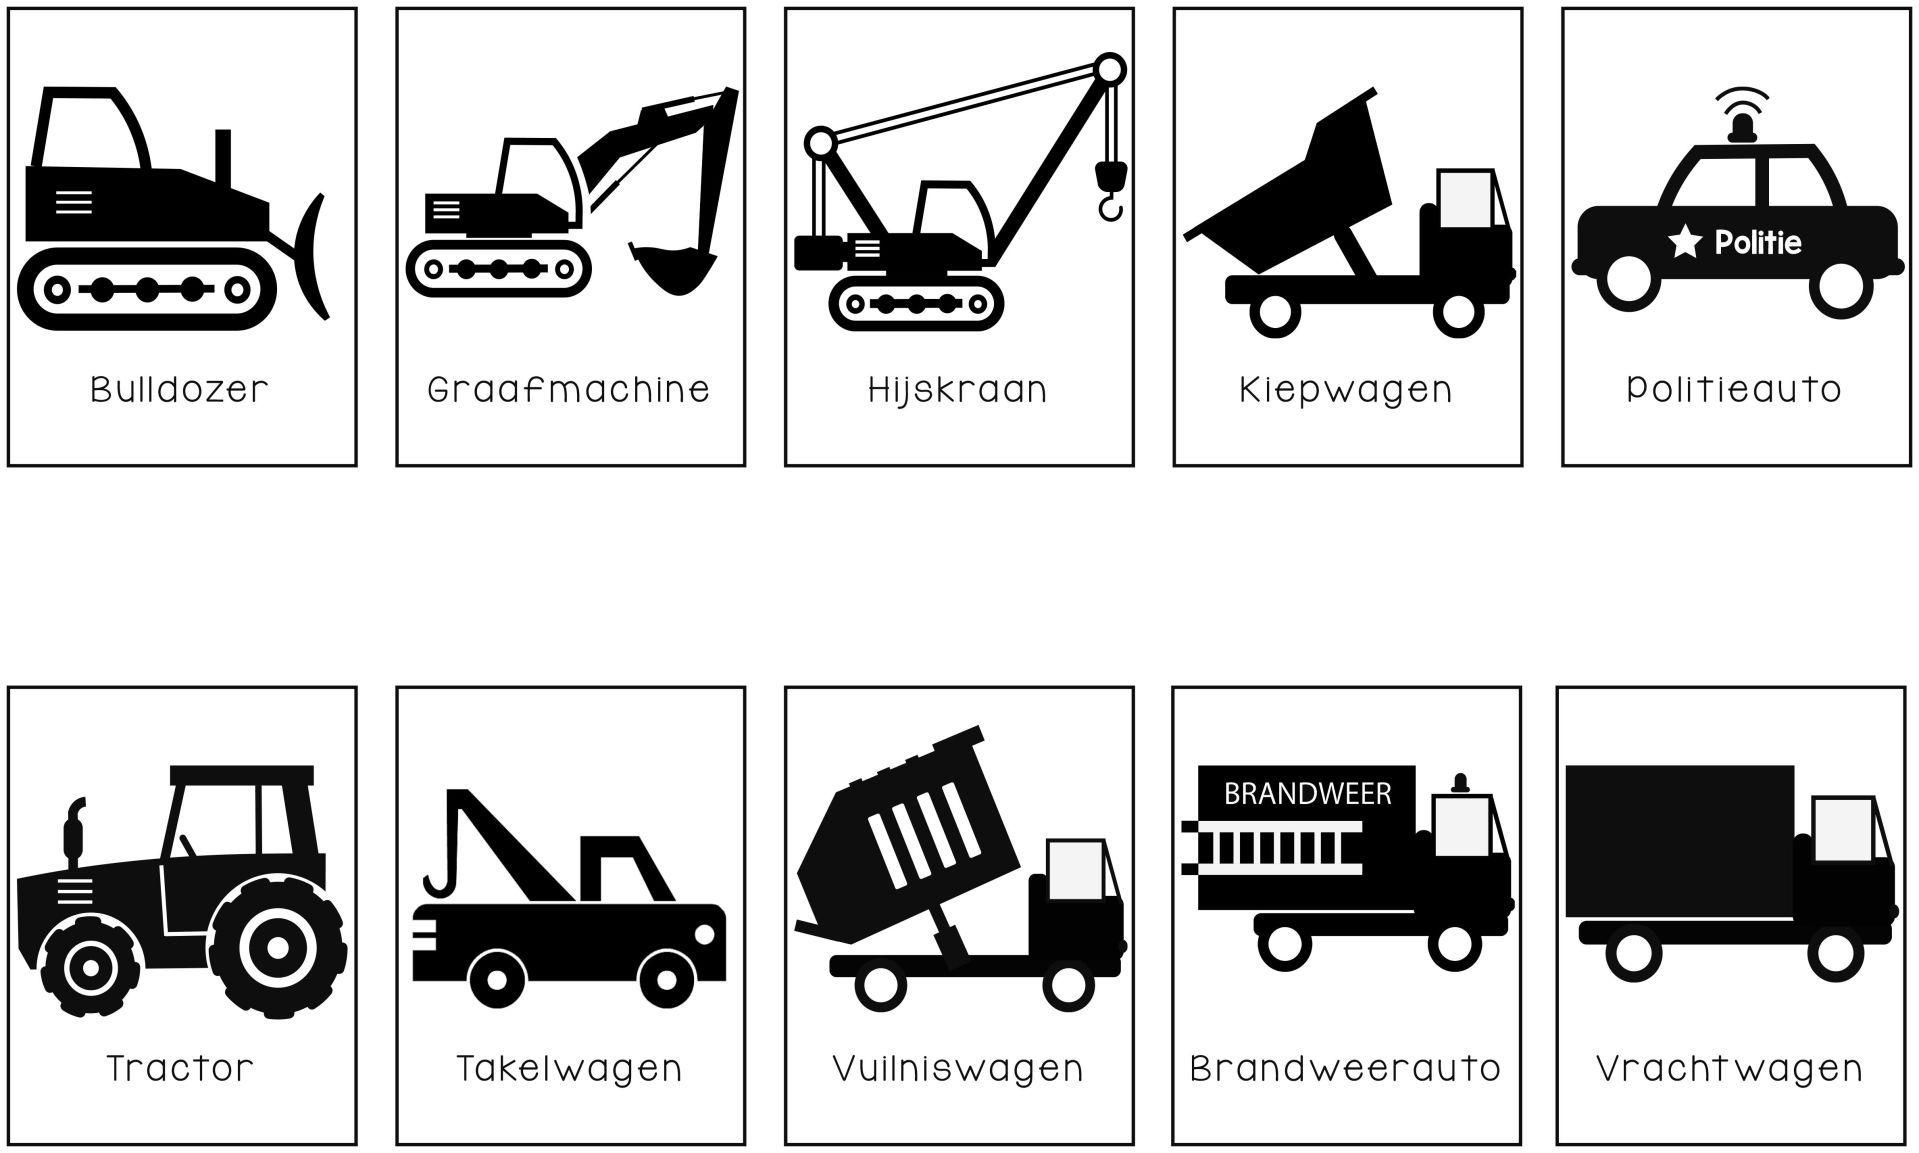 Voertuigen Posters Styled By Joyce Takelwagen Vuilniswagen Brandweerauto